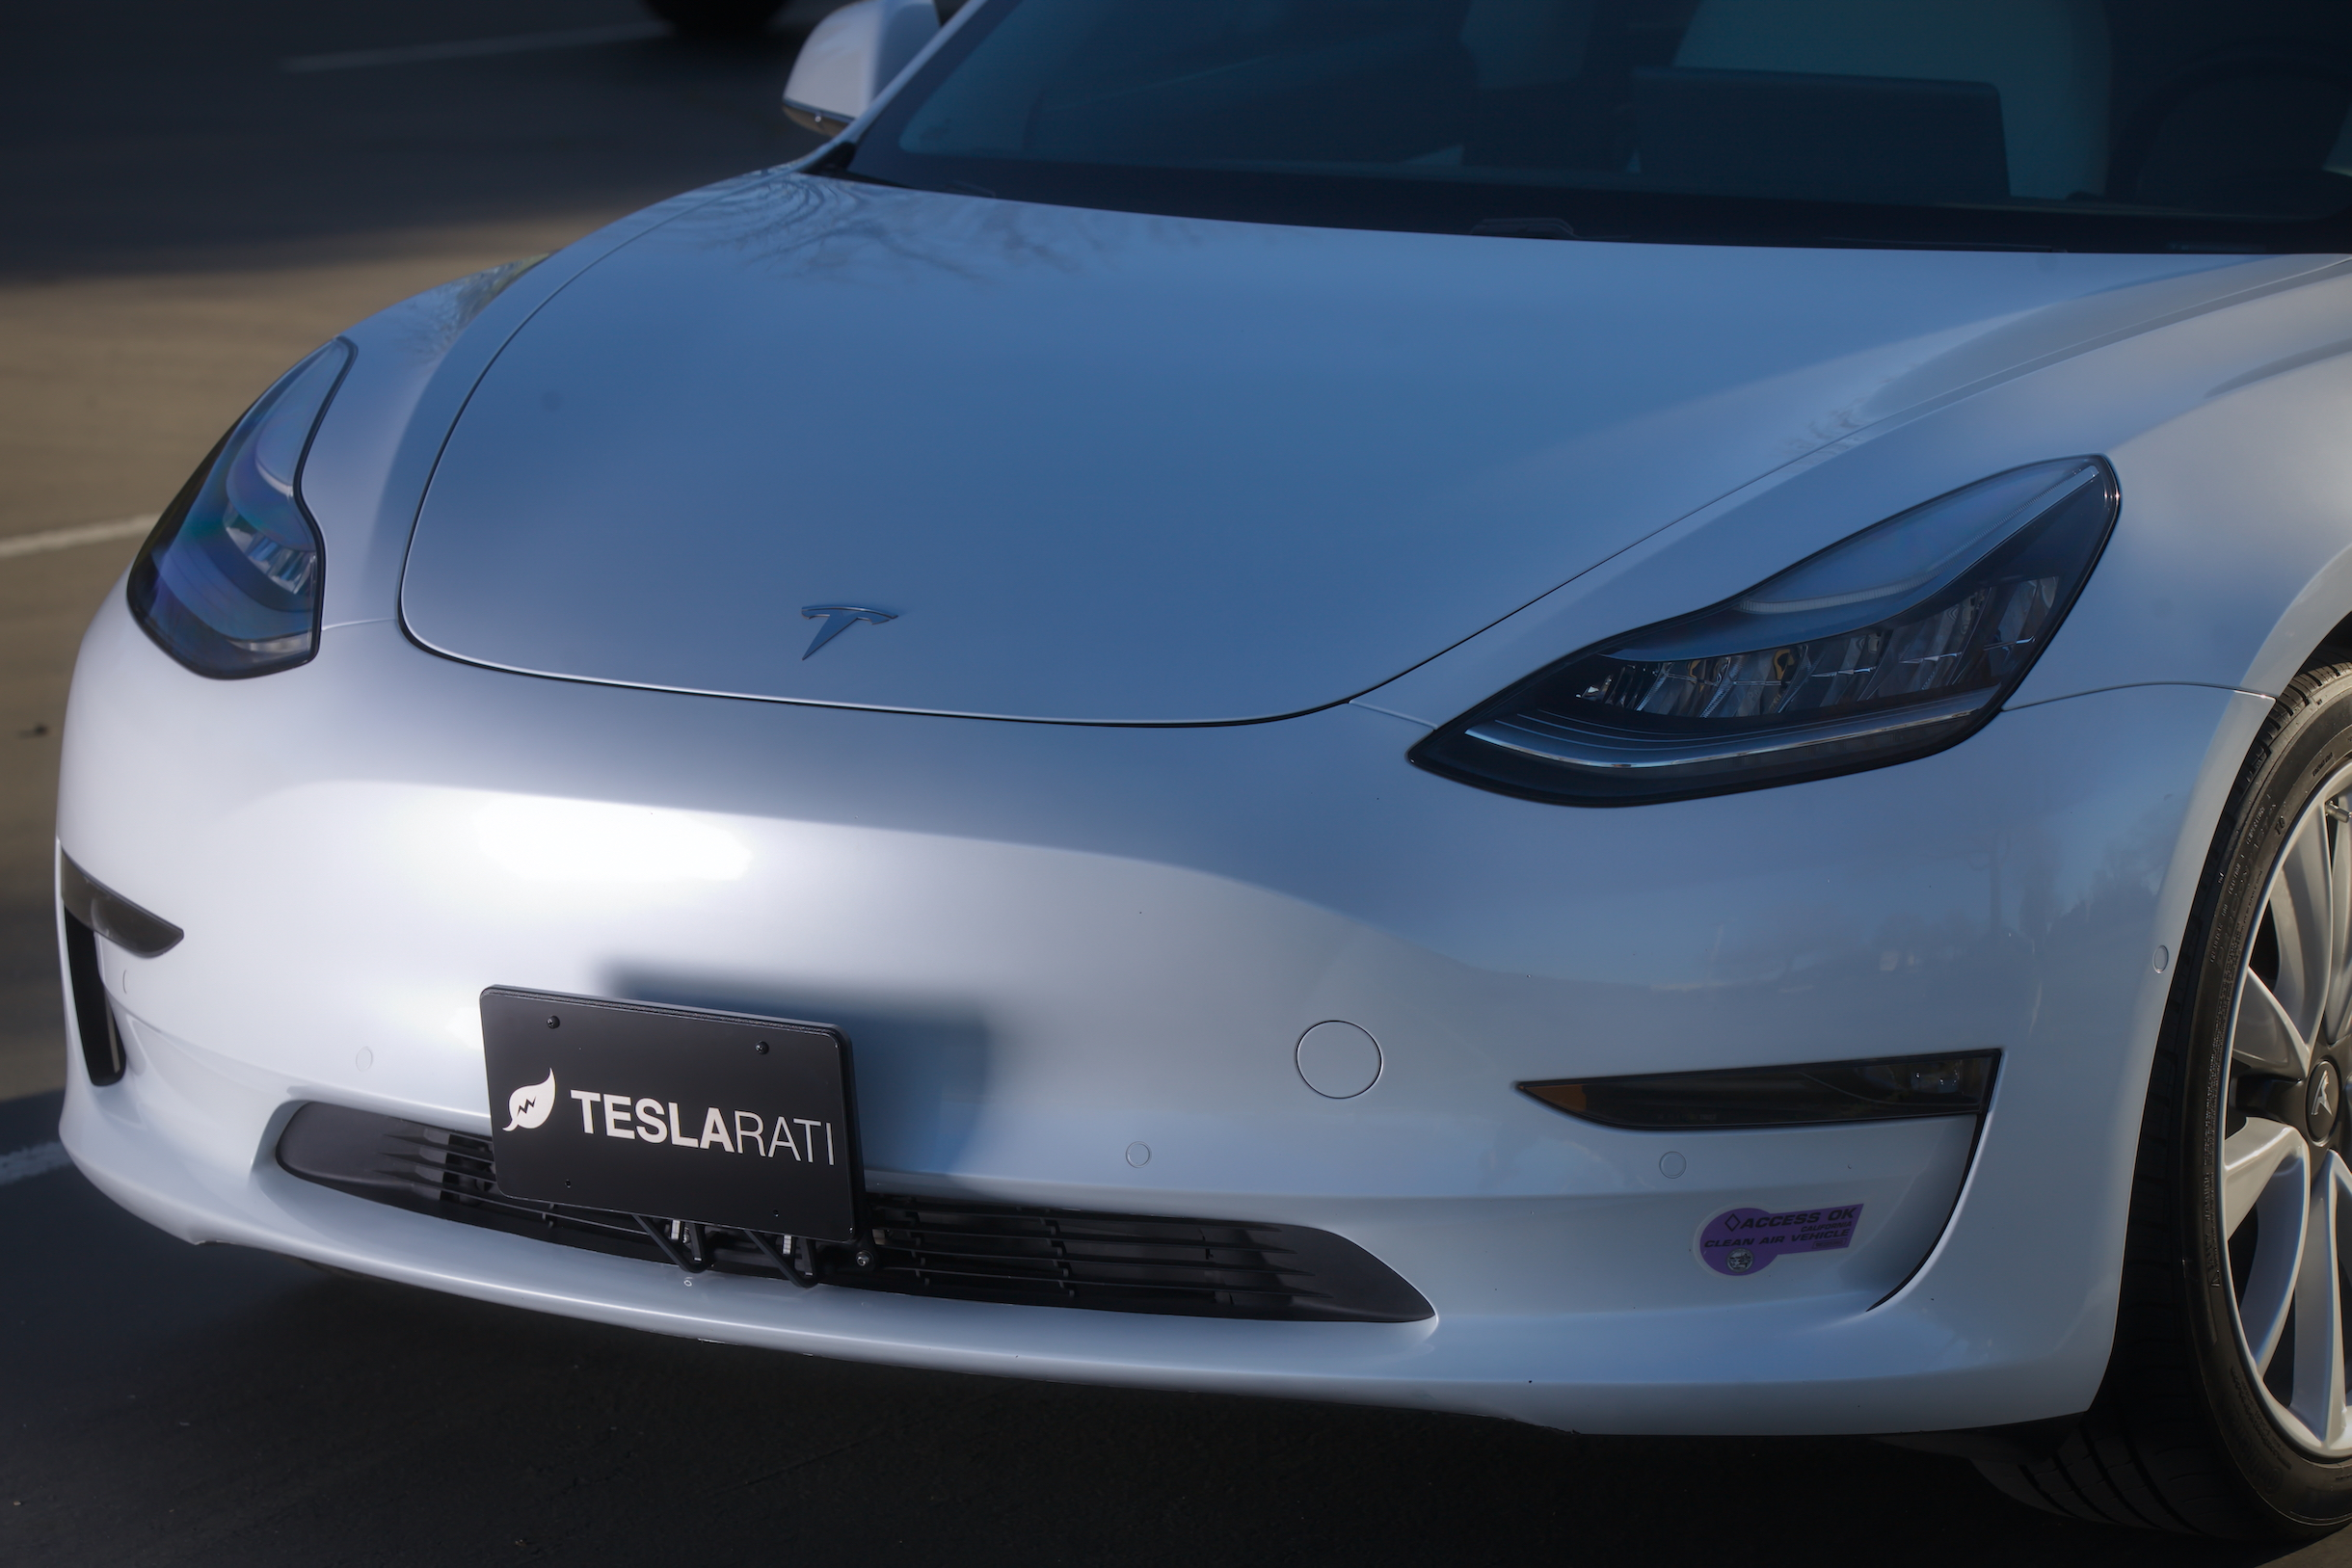 tesla-model-3-front-license-plate-mount-headlights